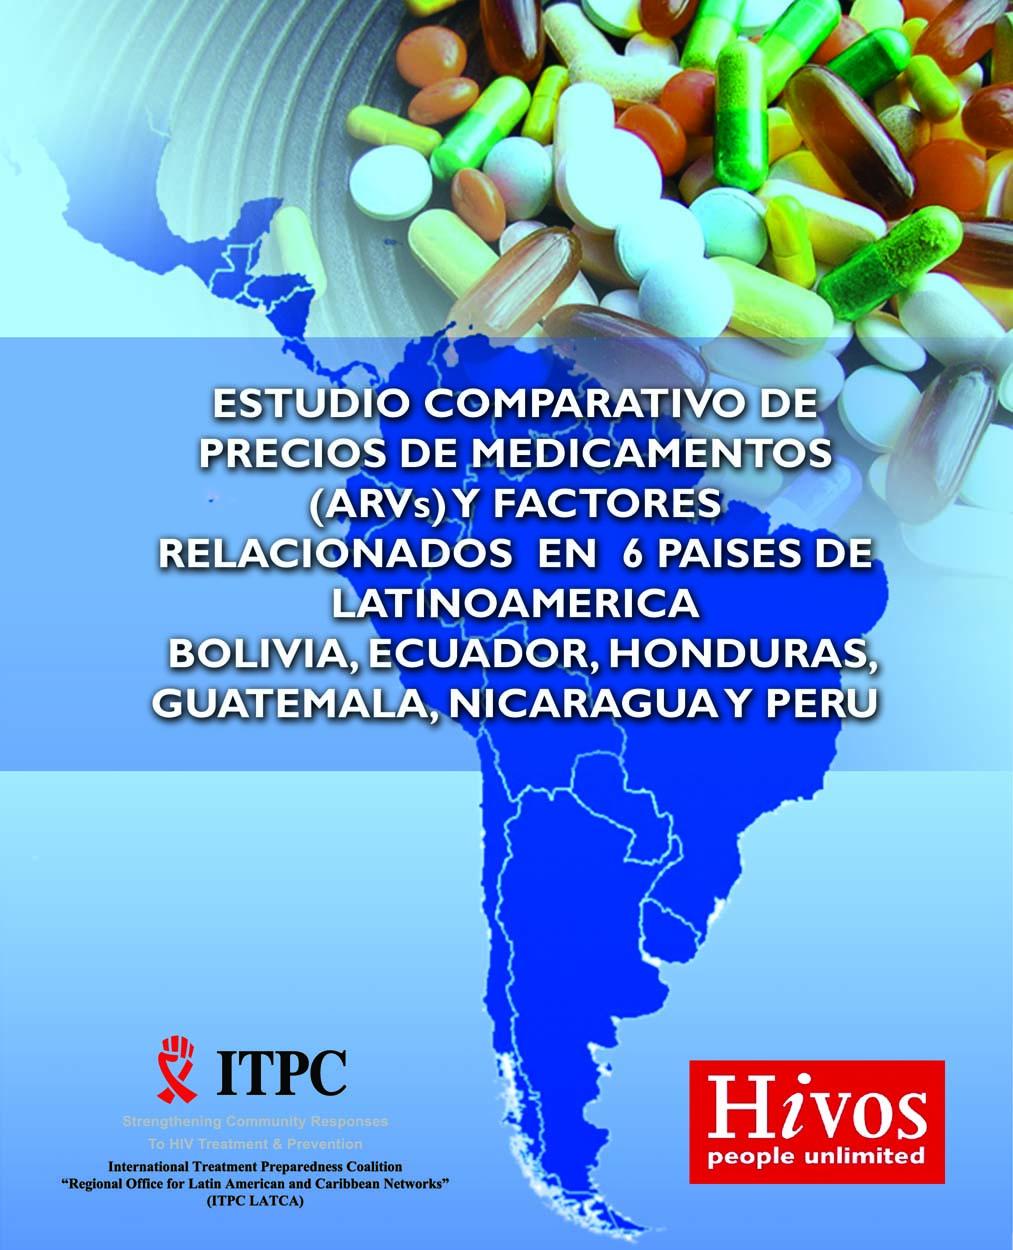 ESTUDIO COMPARATIVO portada 2